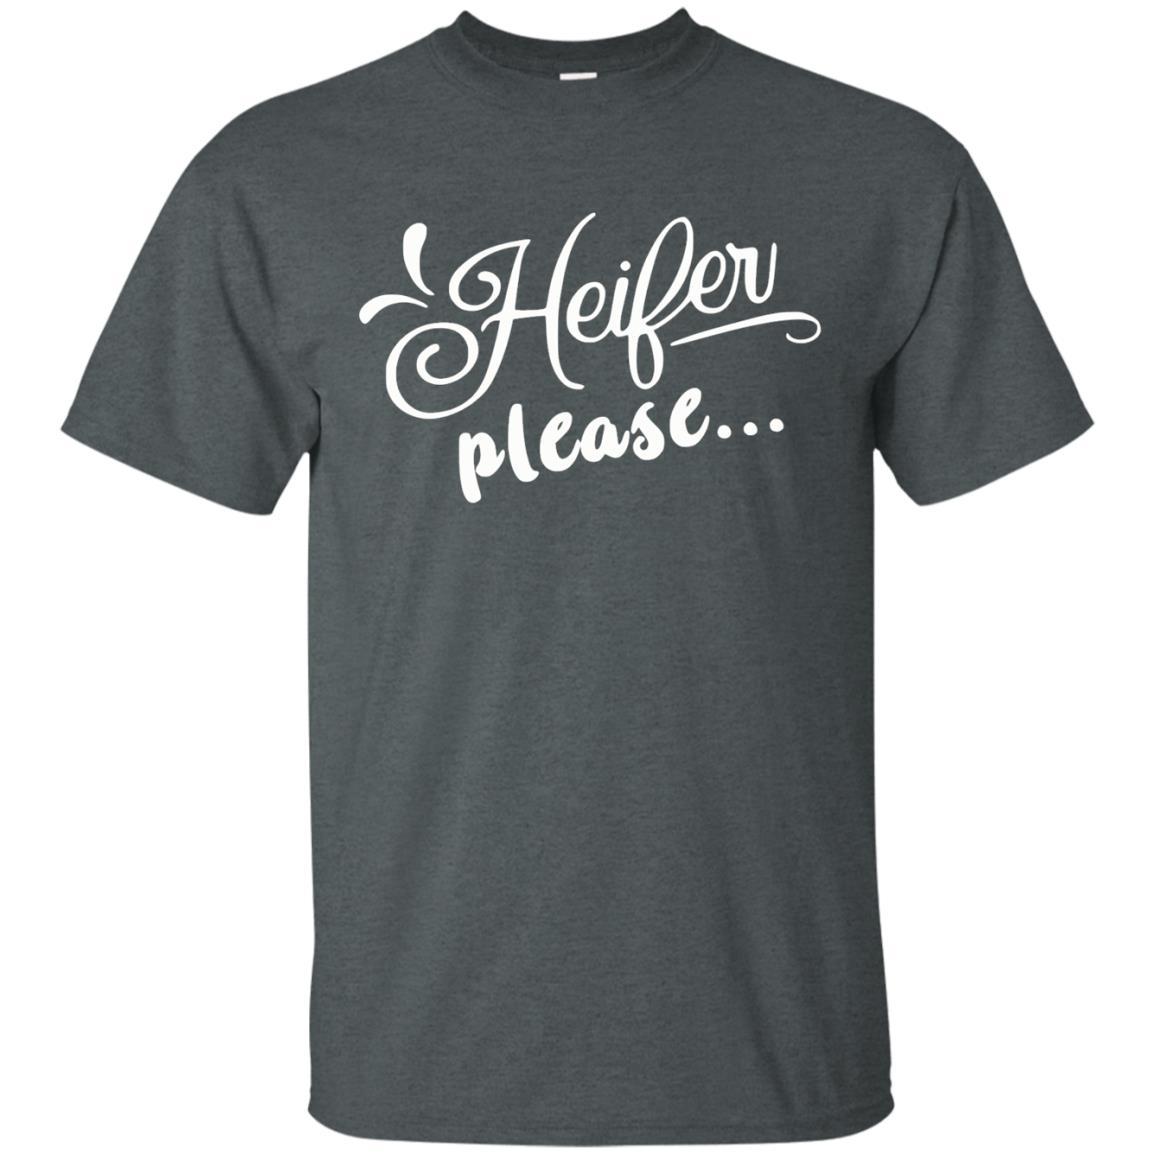 image 2144 - Heifer Please shirt, sweater: funny farmer apparel